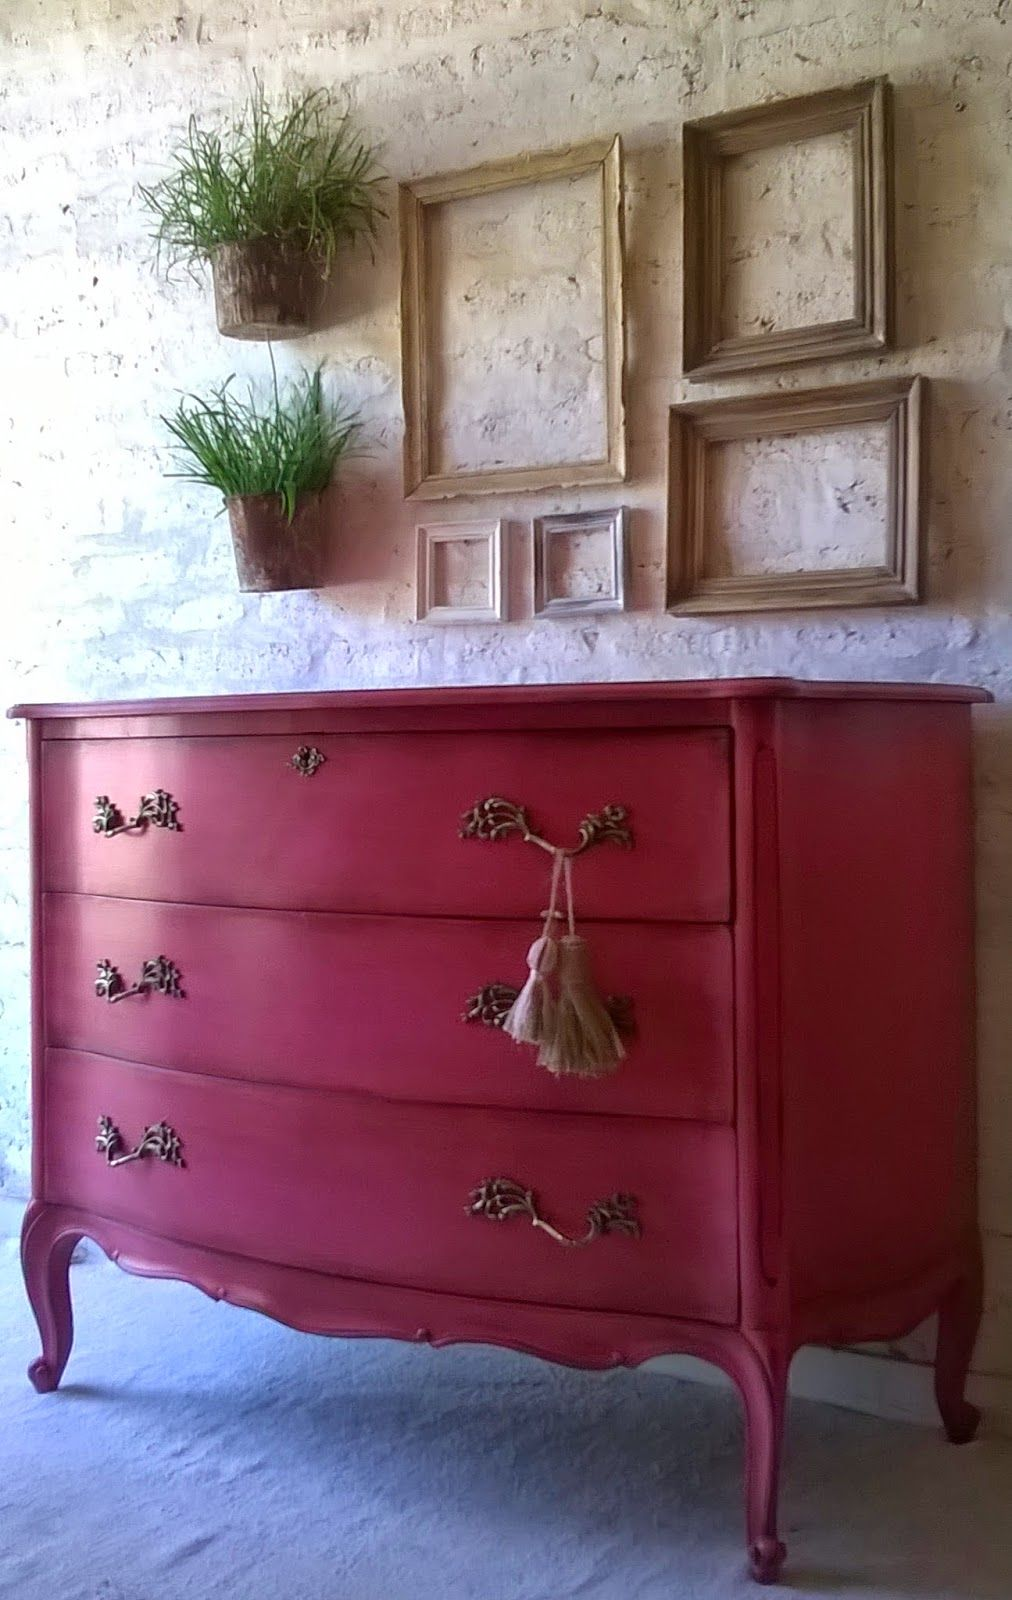 C moda antigua luis xv fucsia envejecido muebles - Muebles antiguos restaurados ...